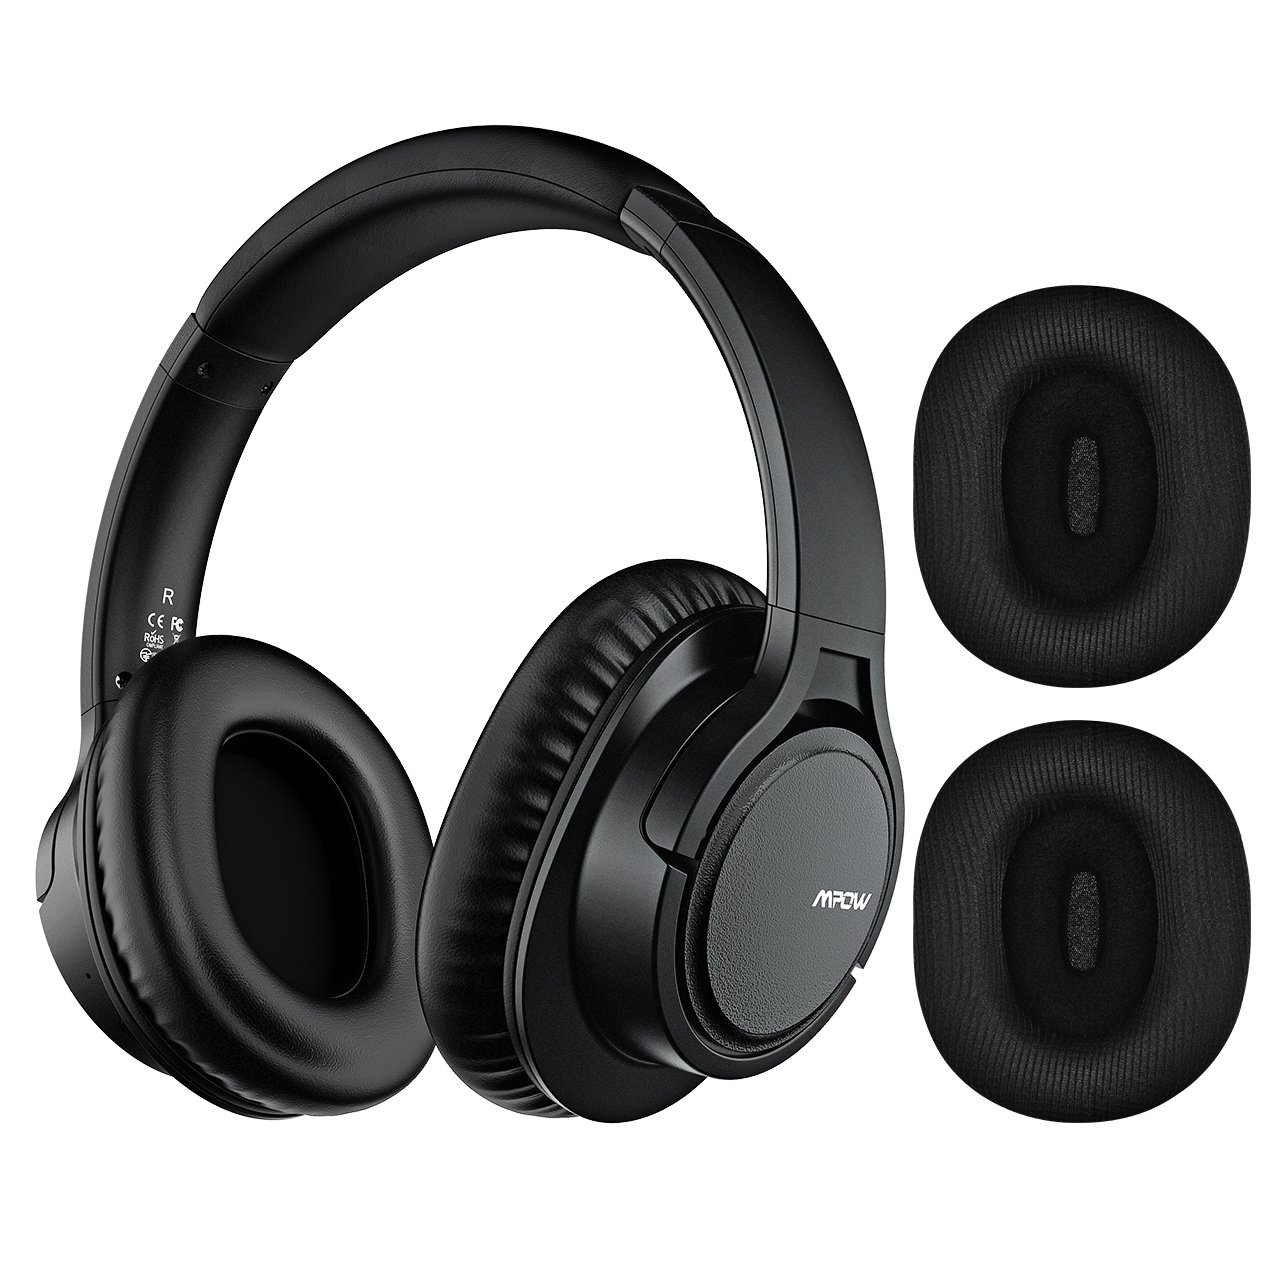 Auriculares : Mpow H7 Plus Aptx Bass Bluetooth Y Con Cable Incluye Microfono